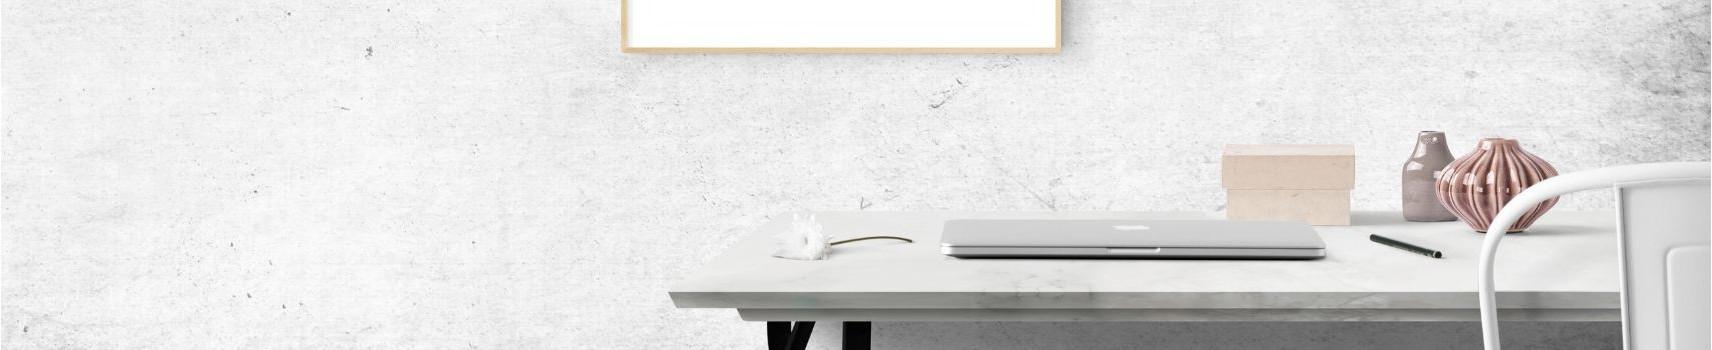 Table & bureau | Mobilier de table en bois ou Bureau en verre | Yesdeko